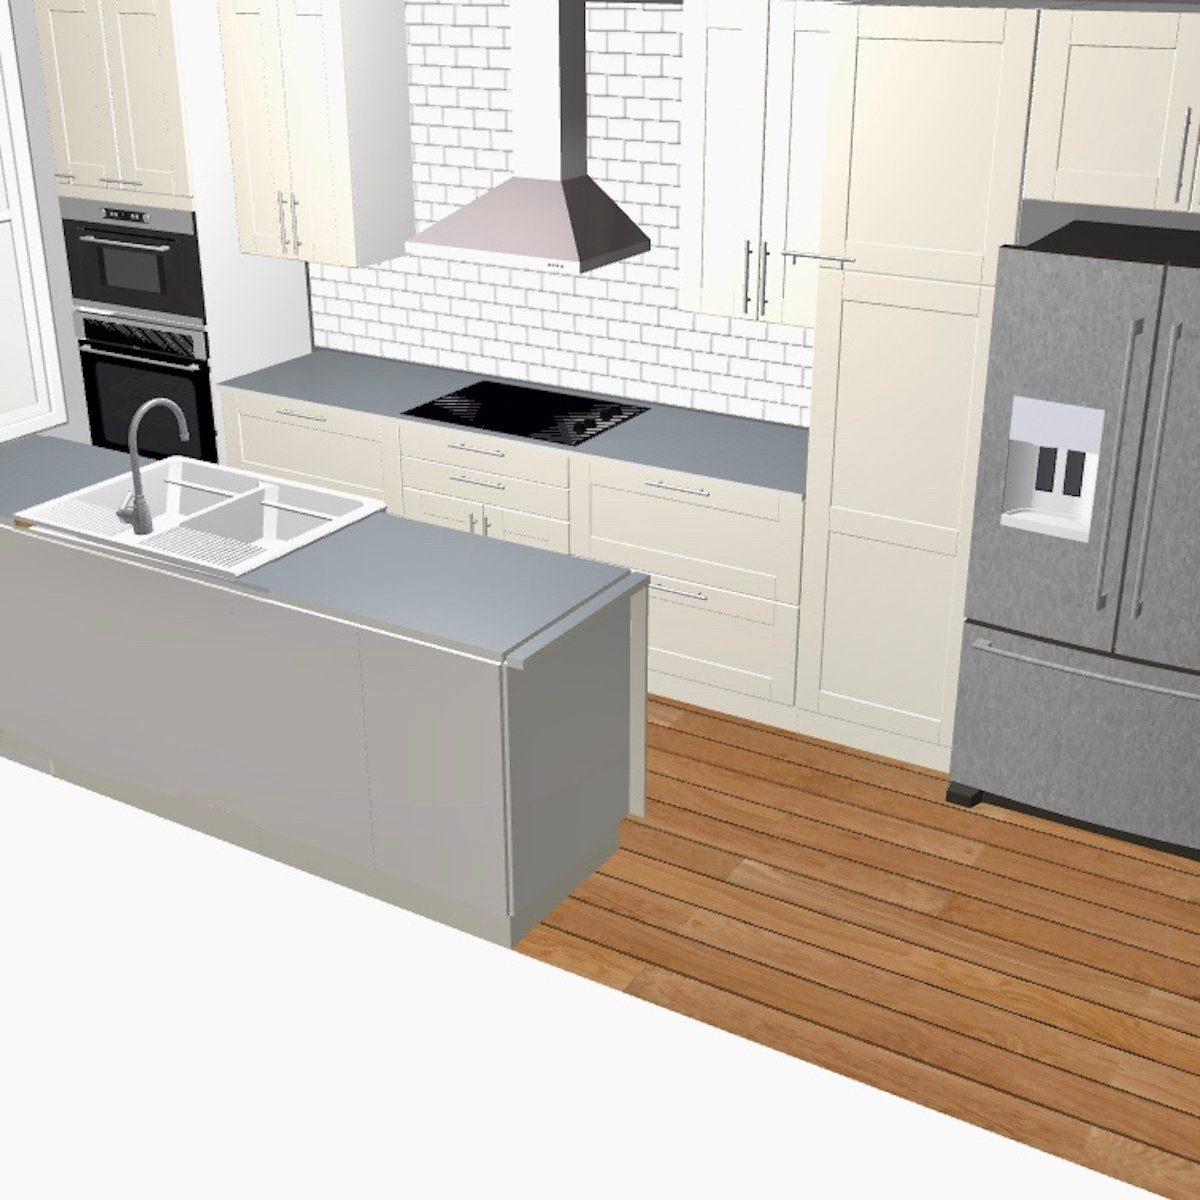 How I Saved $30,000+ on My Kitchen Renovation   Taste of Home